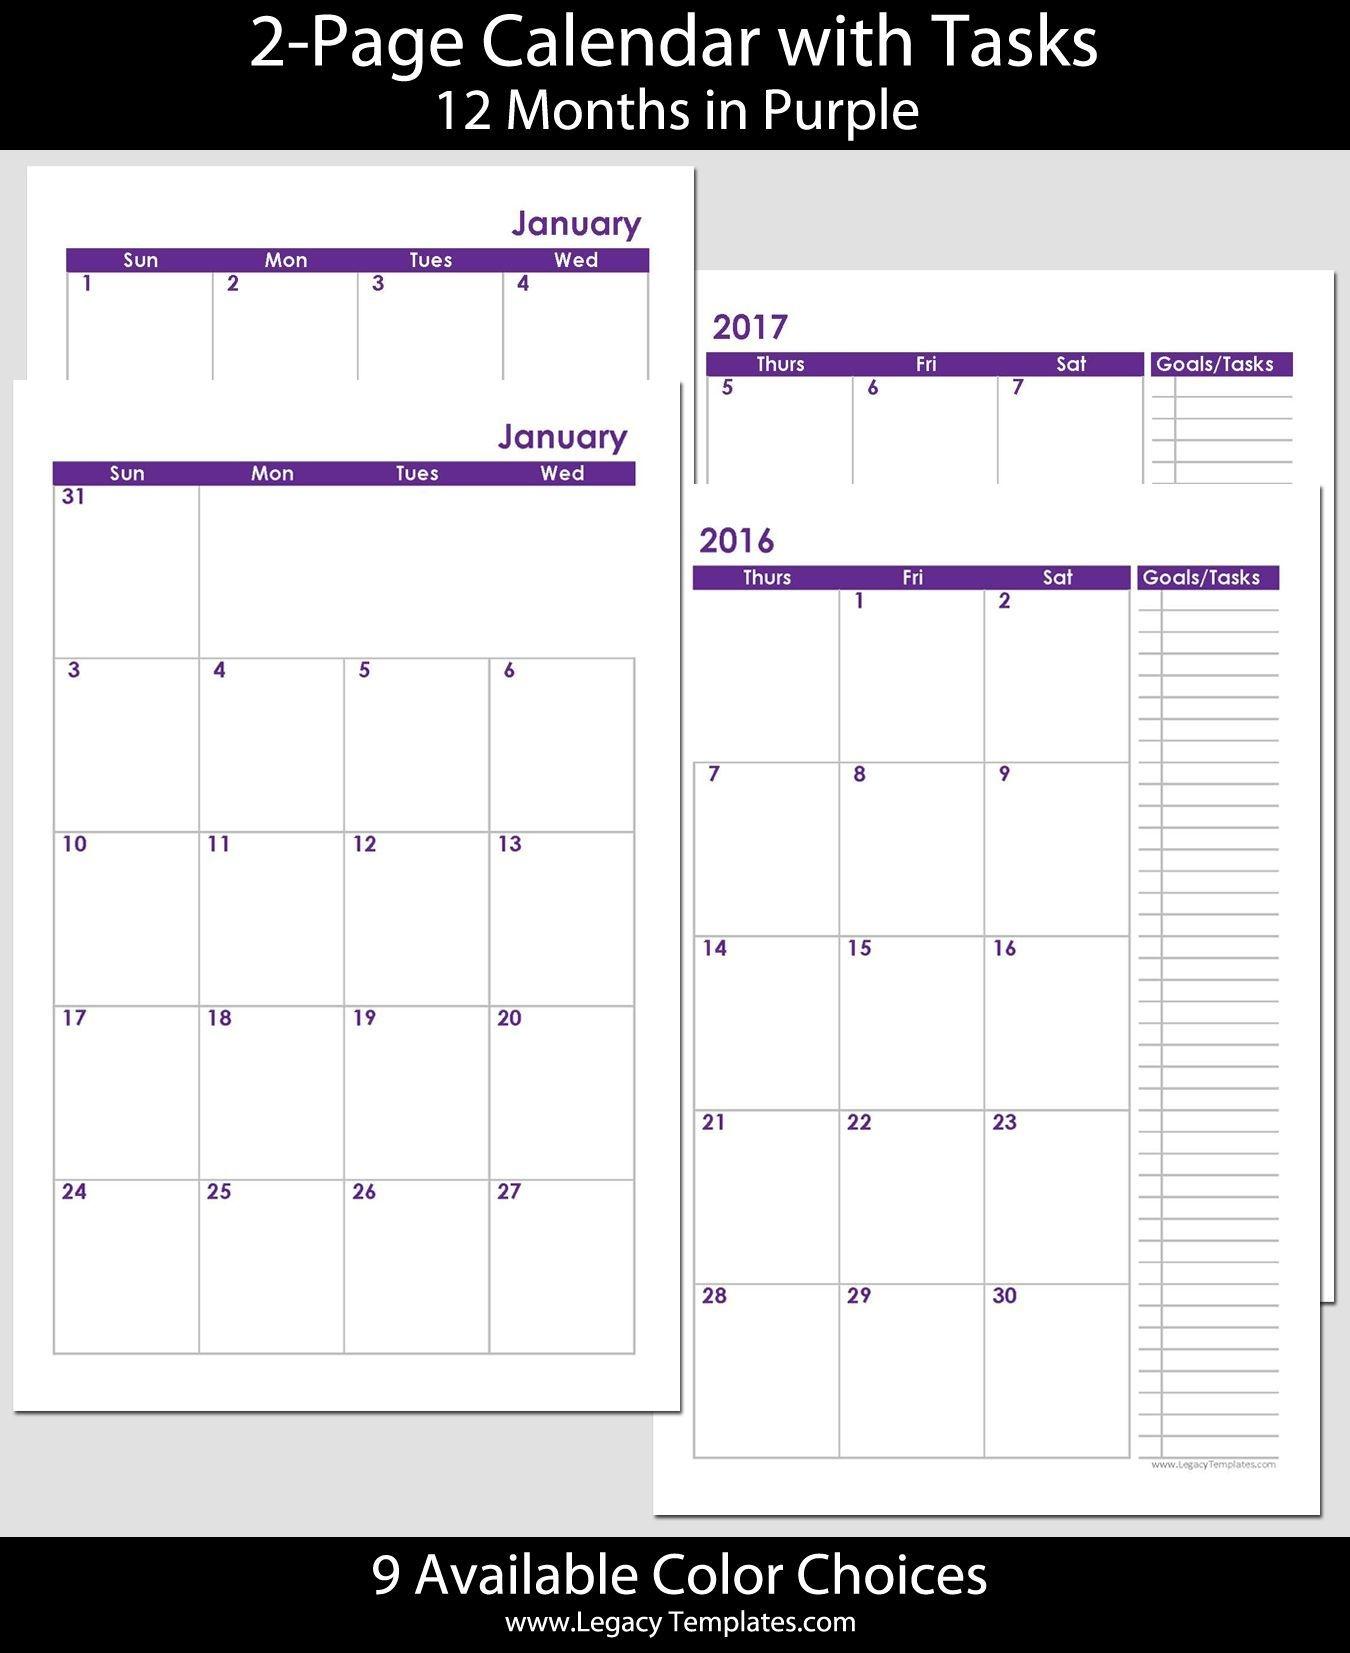 2016 & 2017 Printable 24-Month 2-Page Calendar - Jr/half